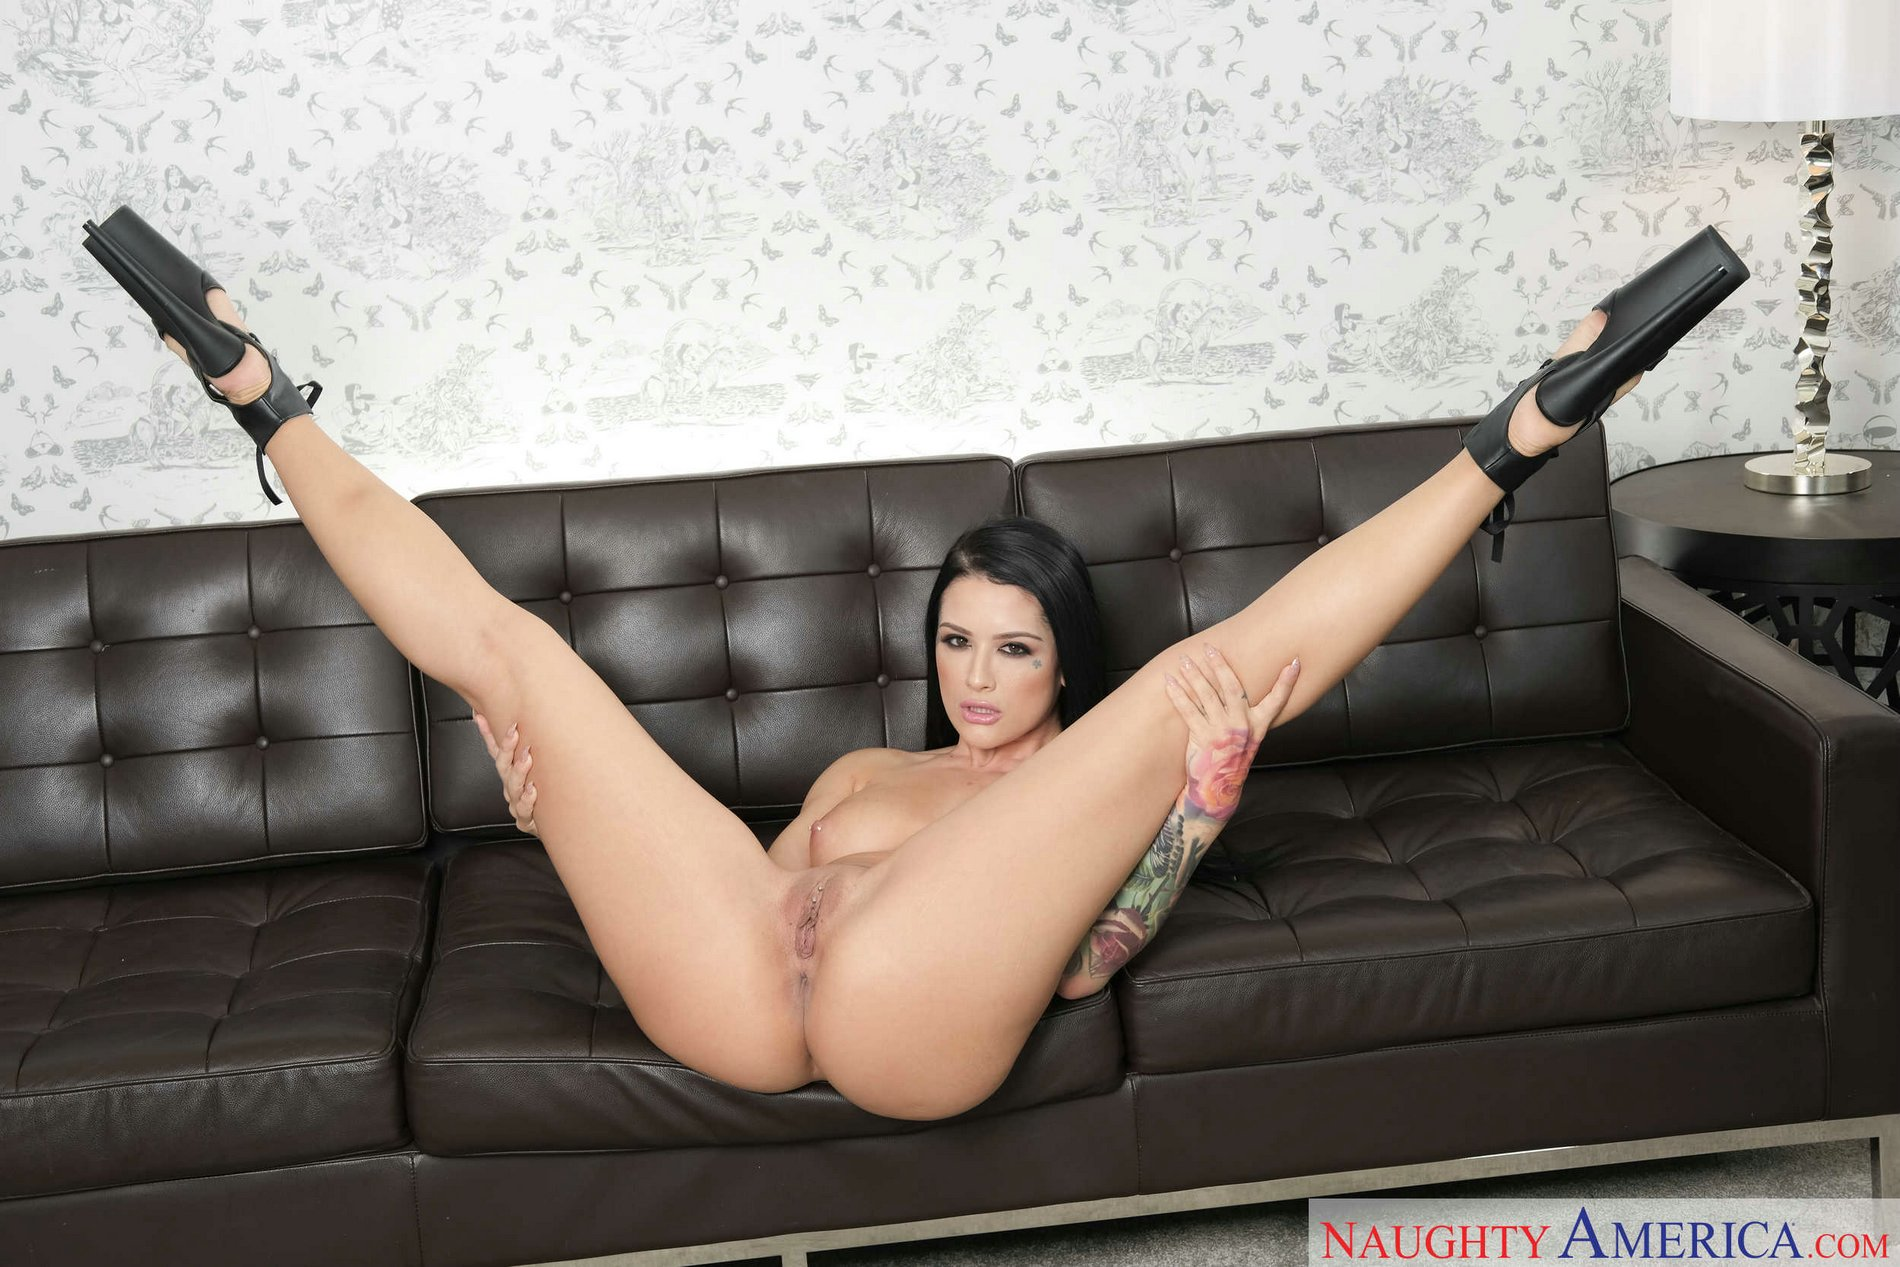 Katrina in sexy high heels speaking